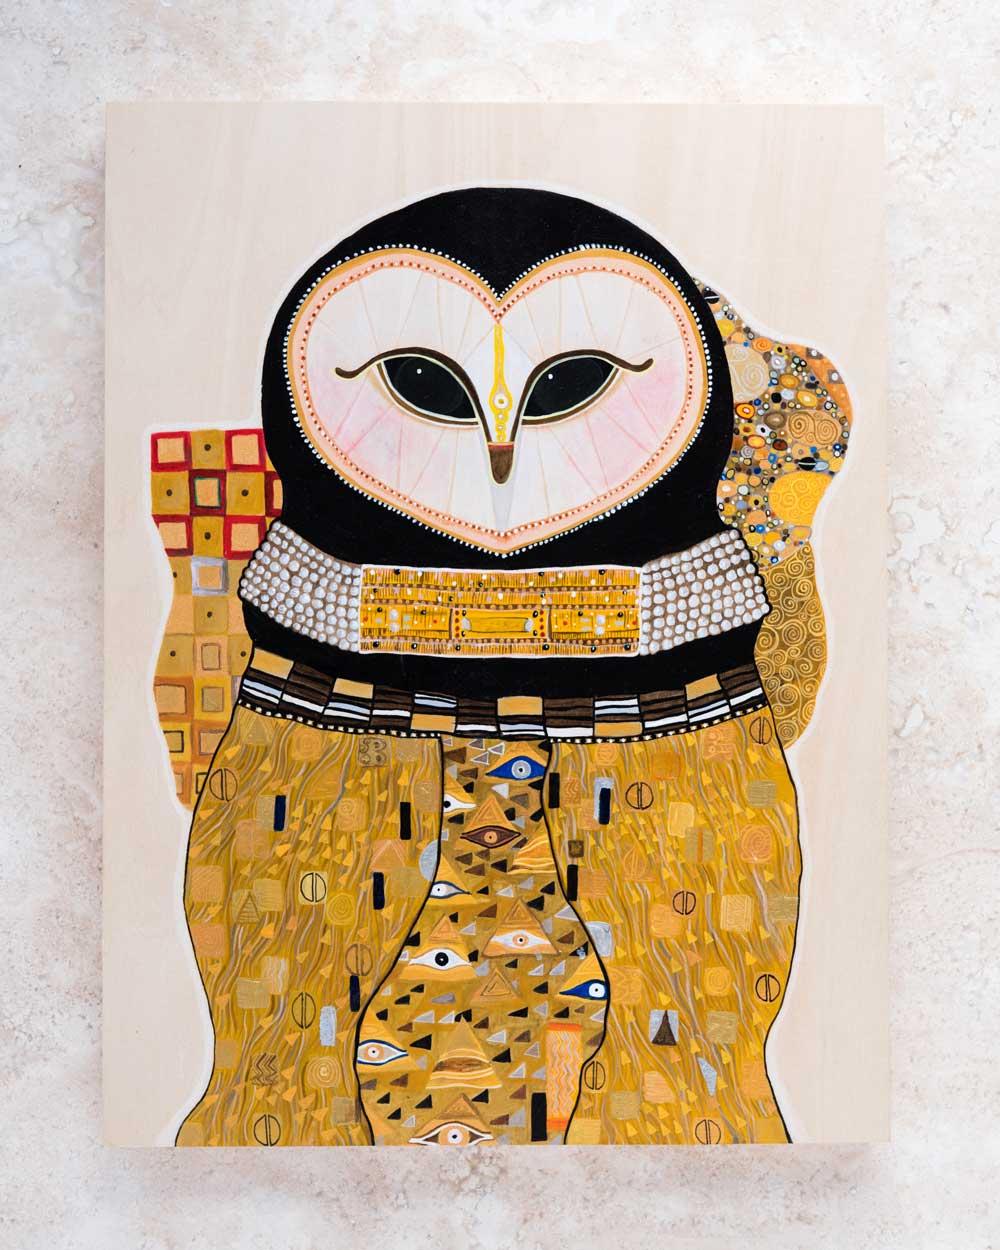 owl_in_gold_painting_wood_panel_eve_devore.jpg